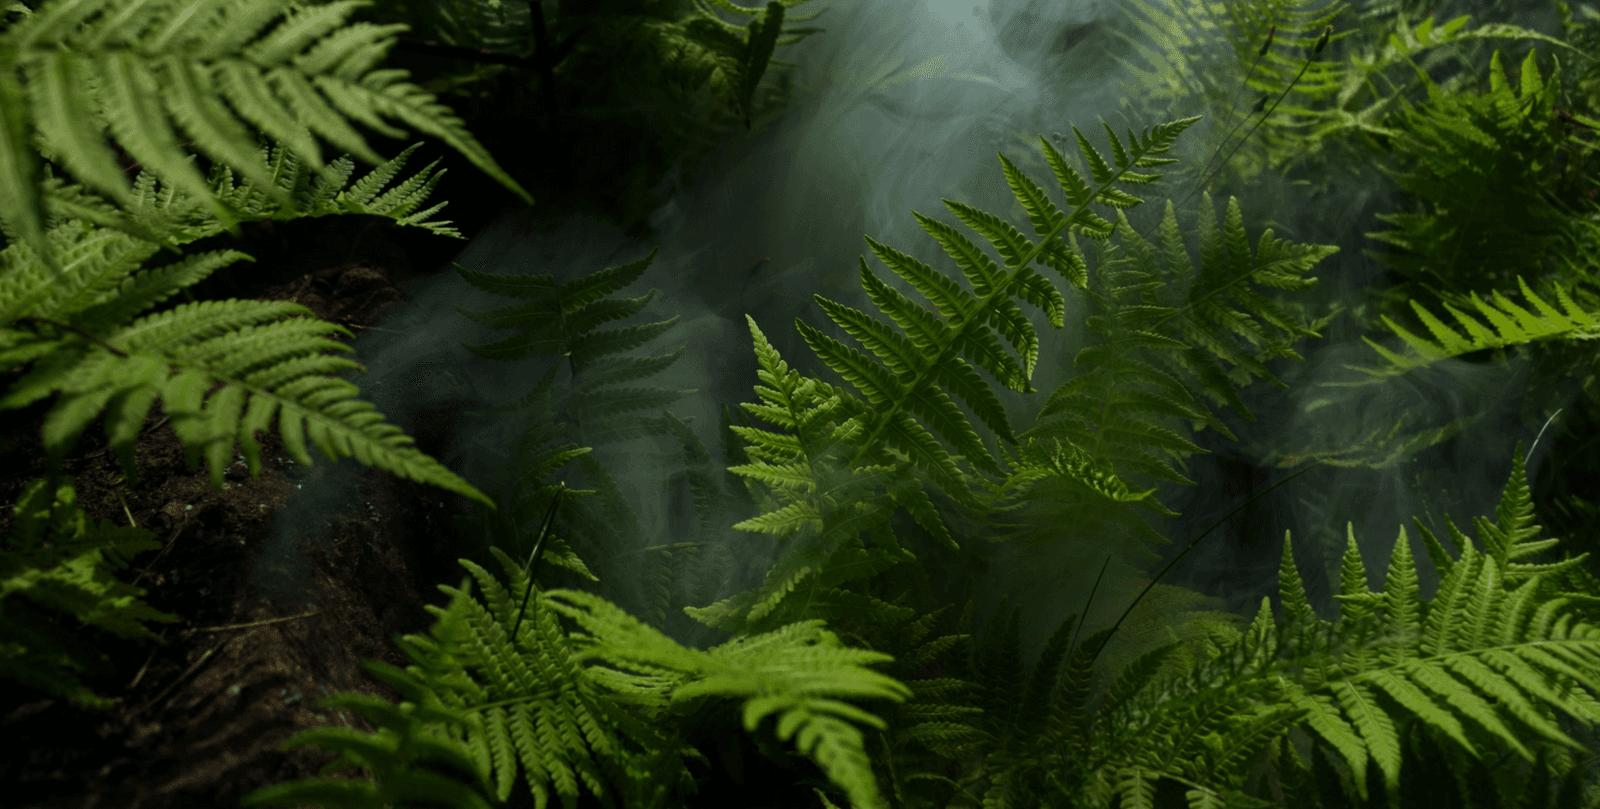 Ferns background image